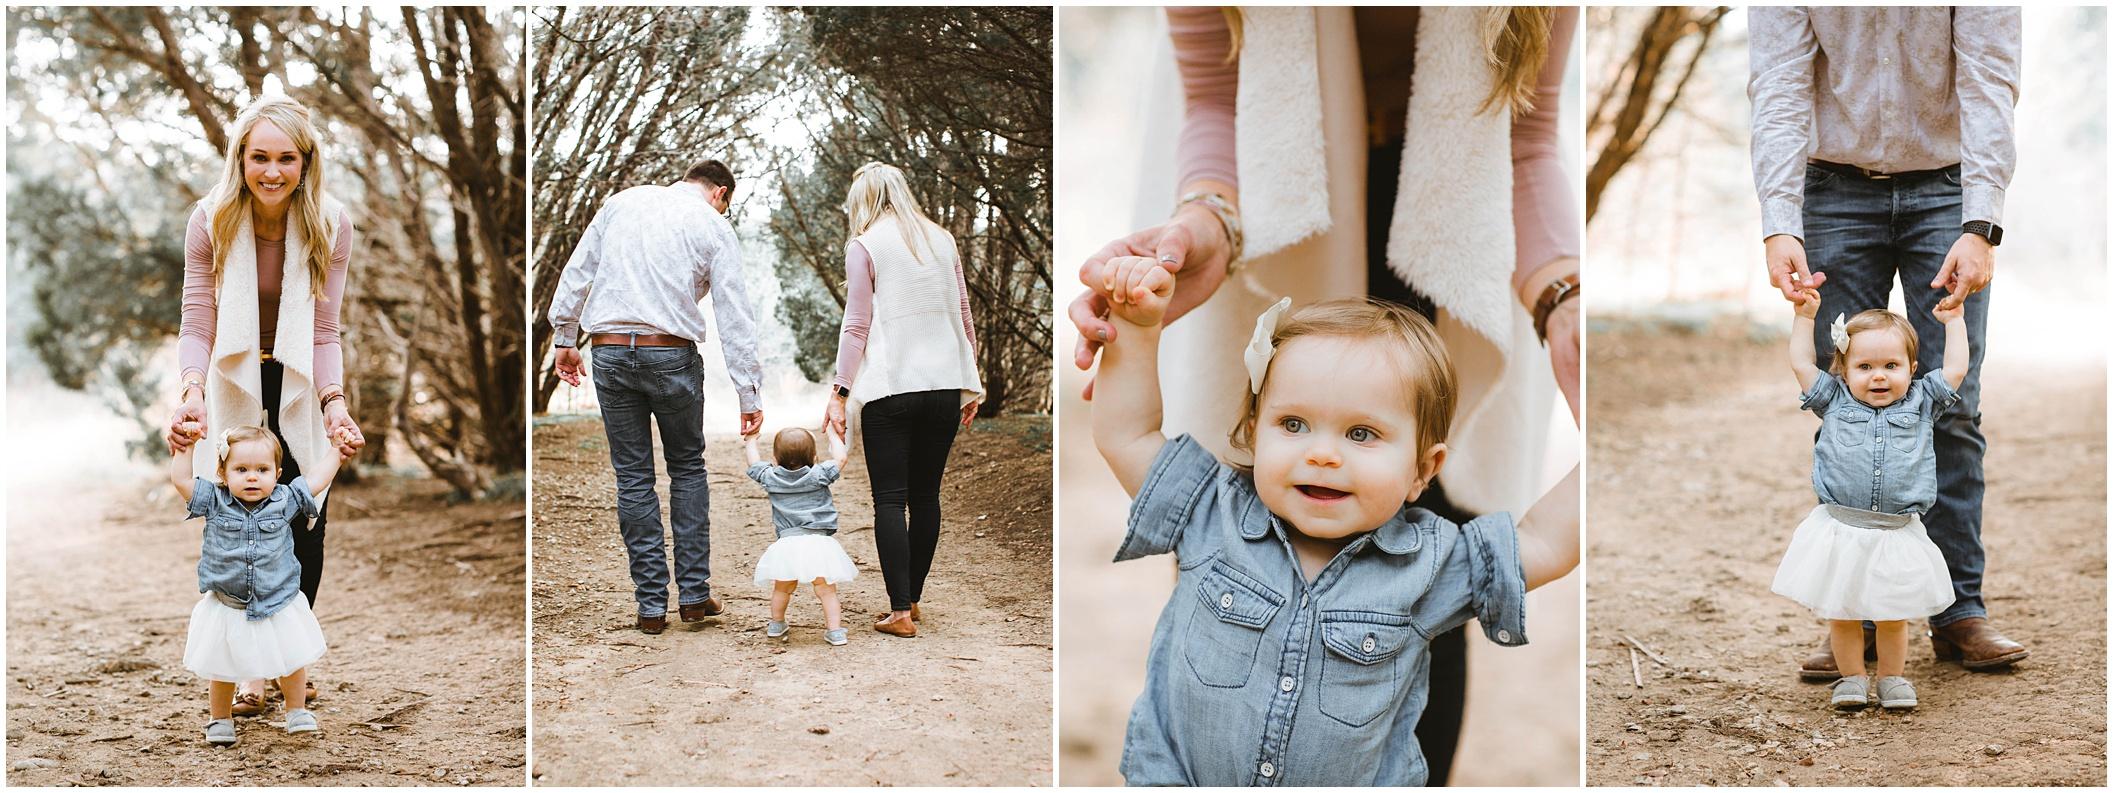 Austin Family Portrait Photography_0217.jpg